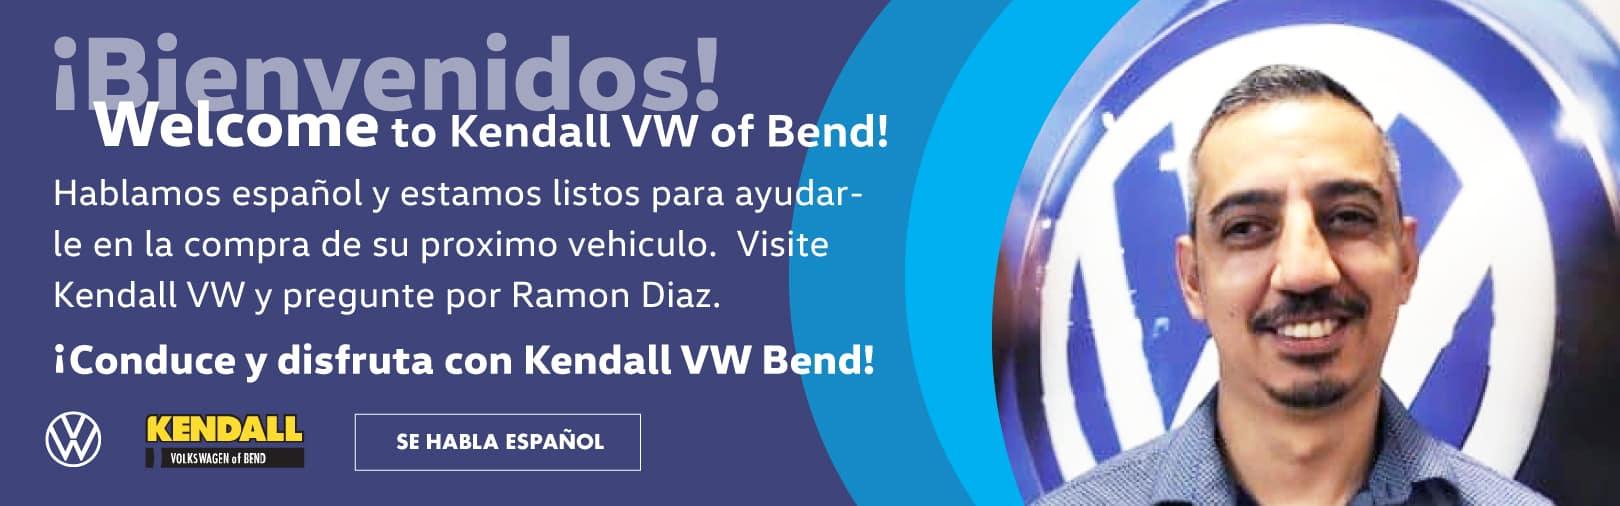 18022-BenVol-Oct21-Web-banners-SPANISH-REV